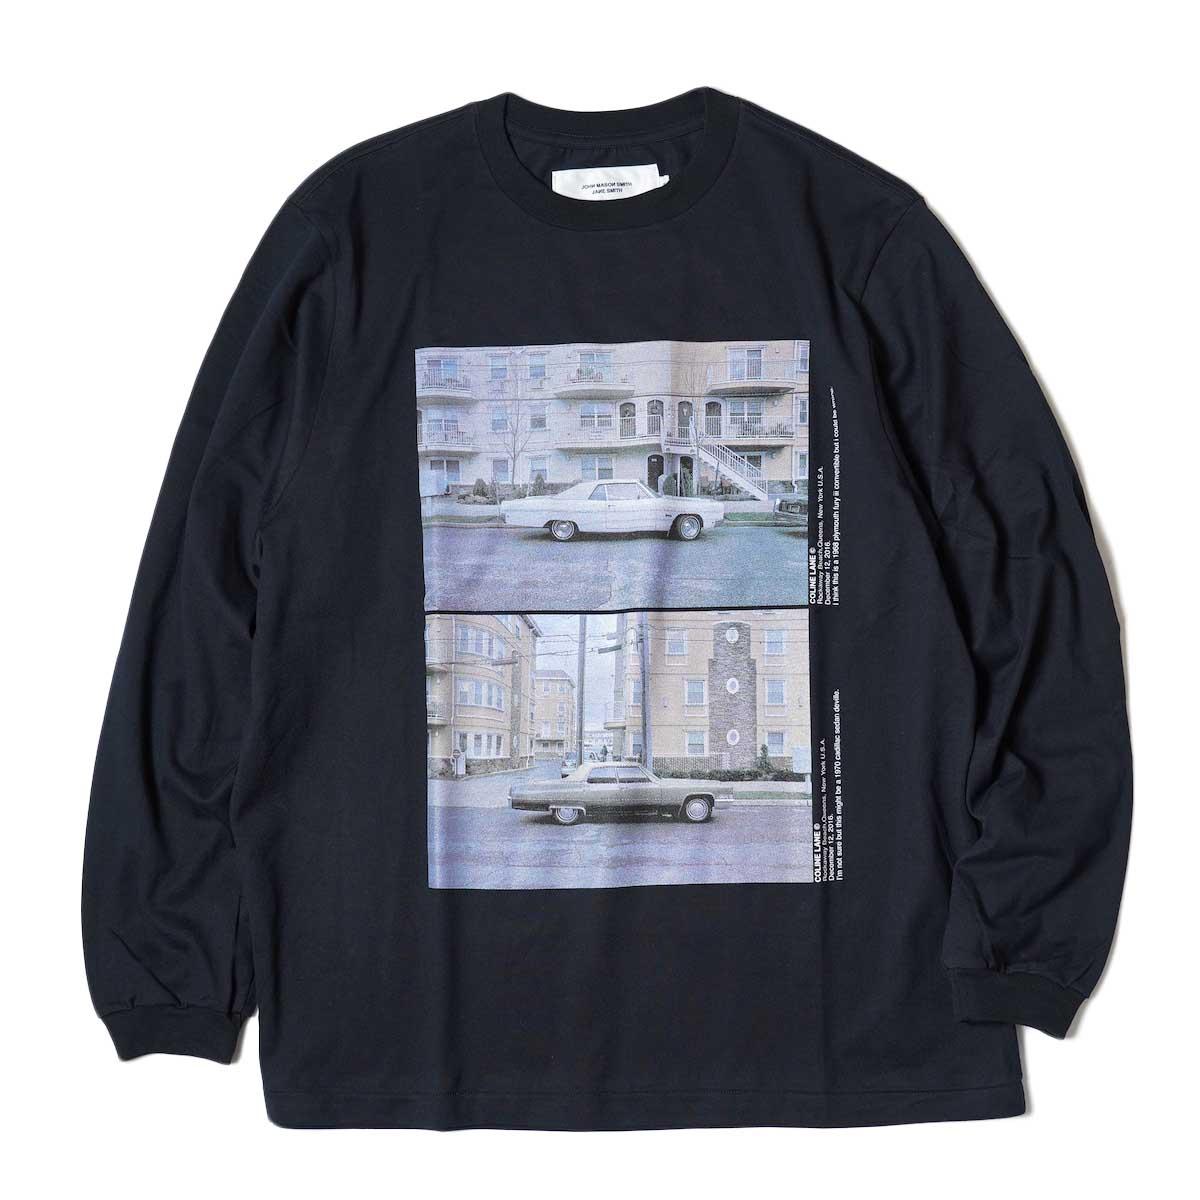 JANE SMITH / CADILLAC PLYMOUTH L/S T-Shirt (Black)